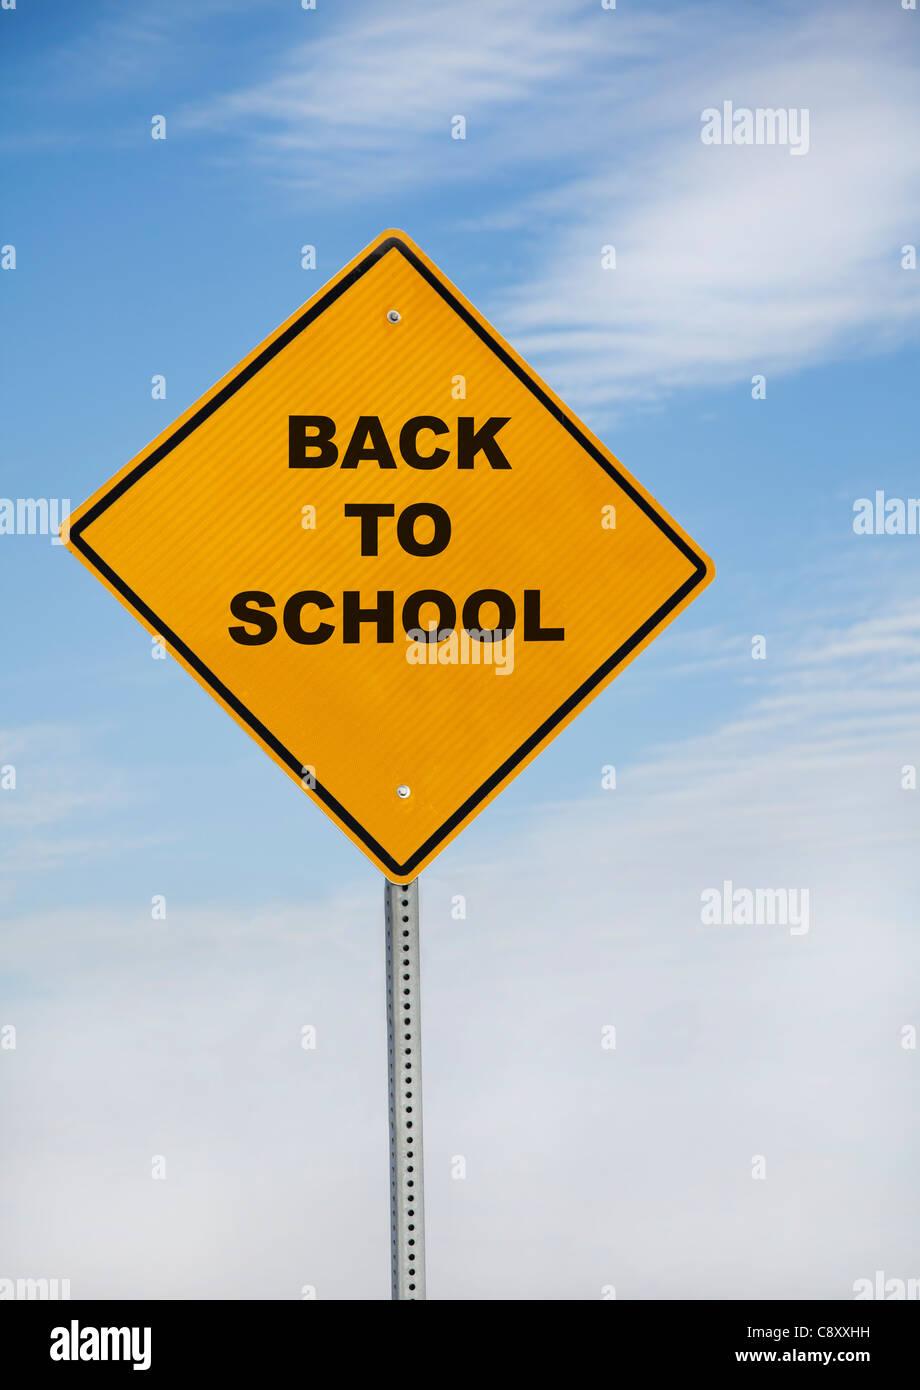 USA, Illinois, Metamora, back to school sign against sky - Stock Image